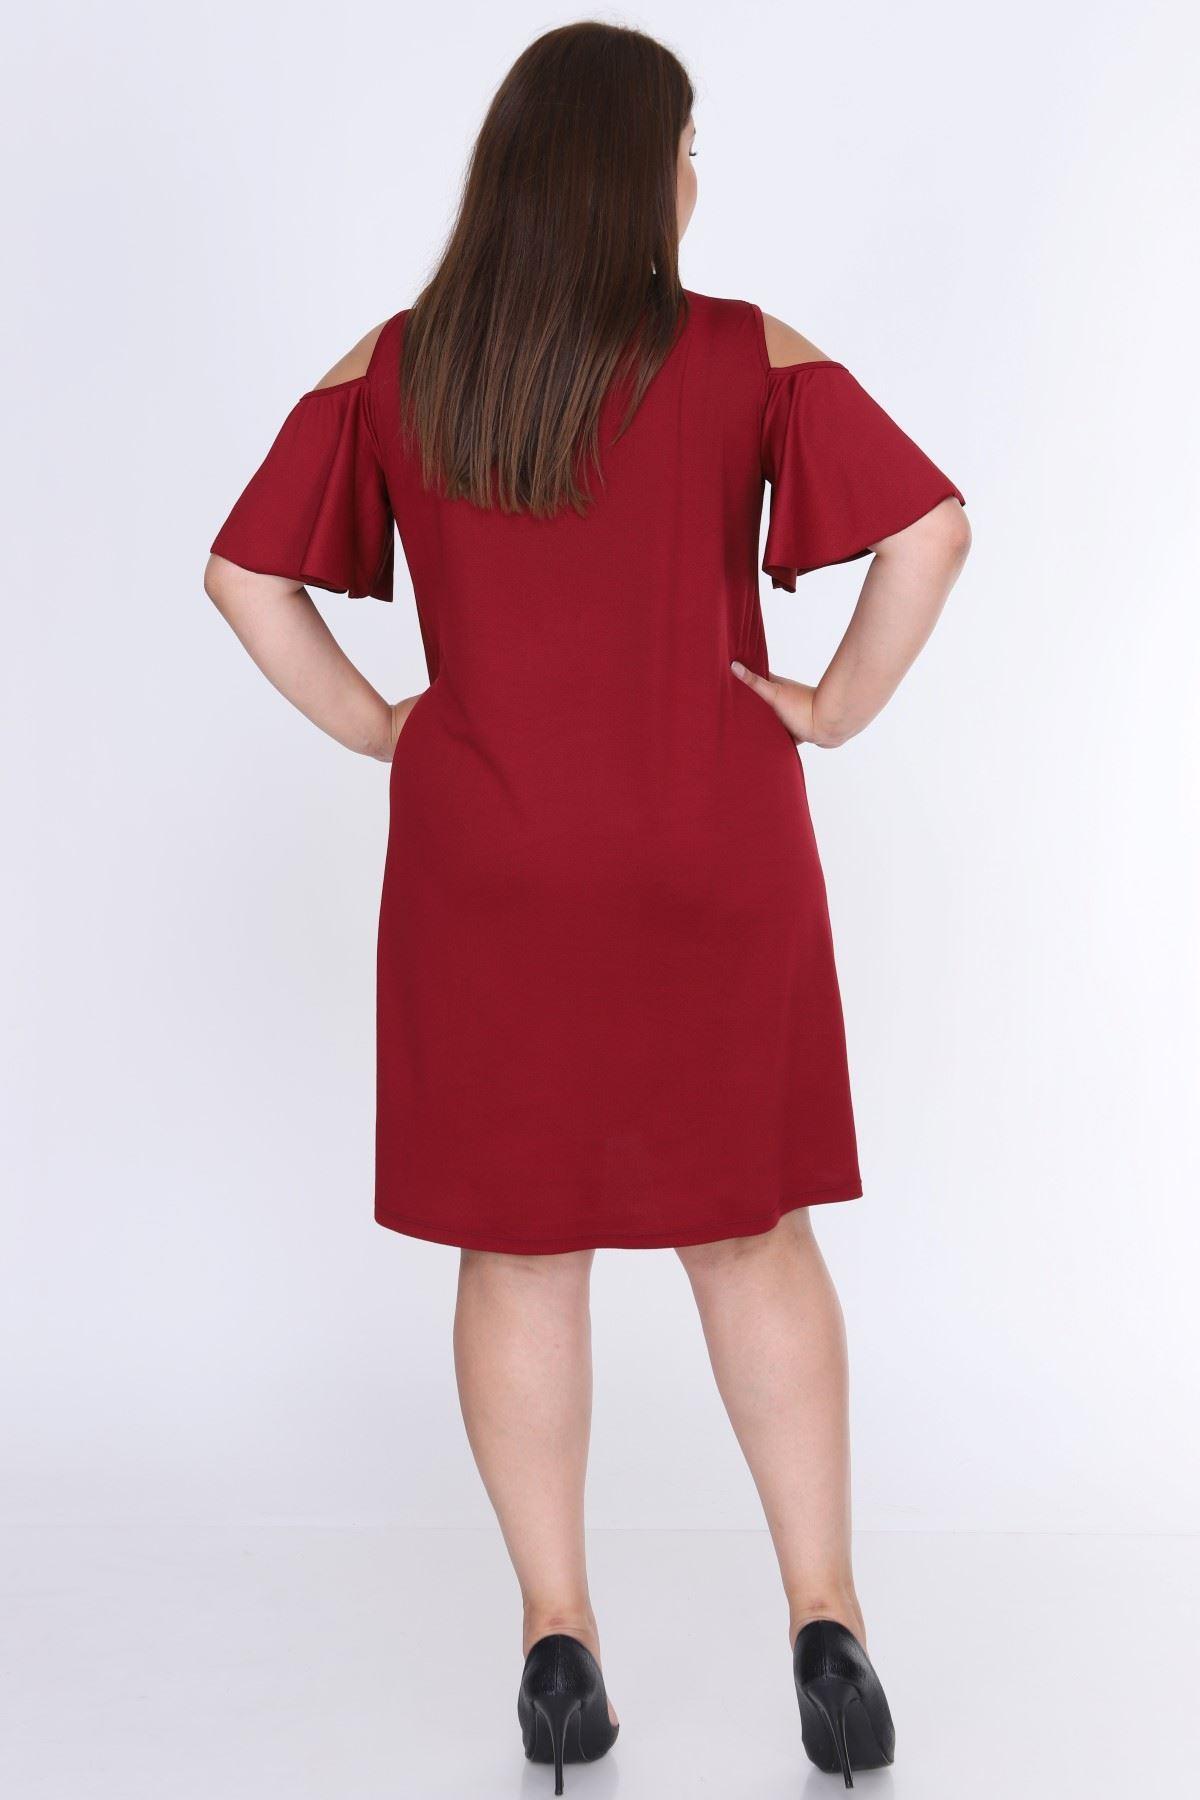 Omuzu Açık Bordo Büyük Beden Elbise 7A-0645